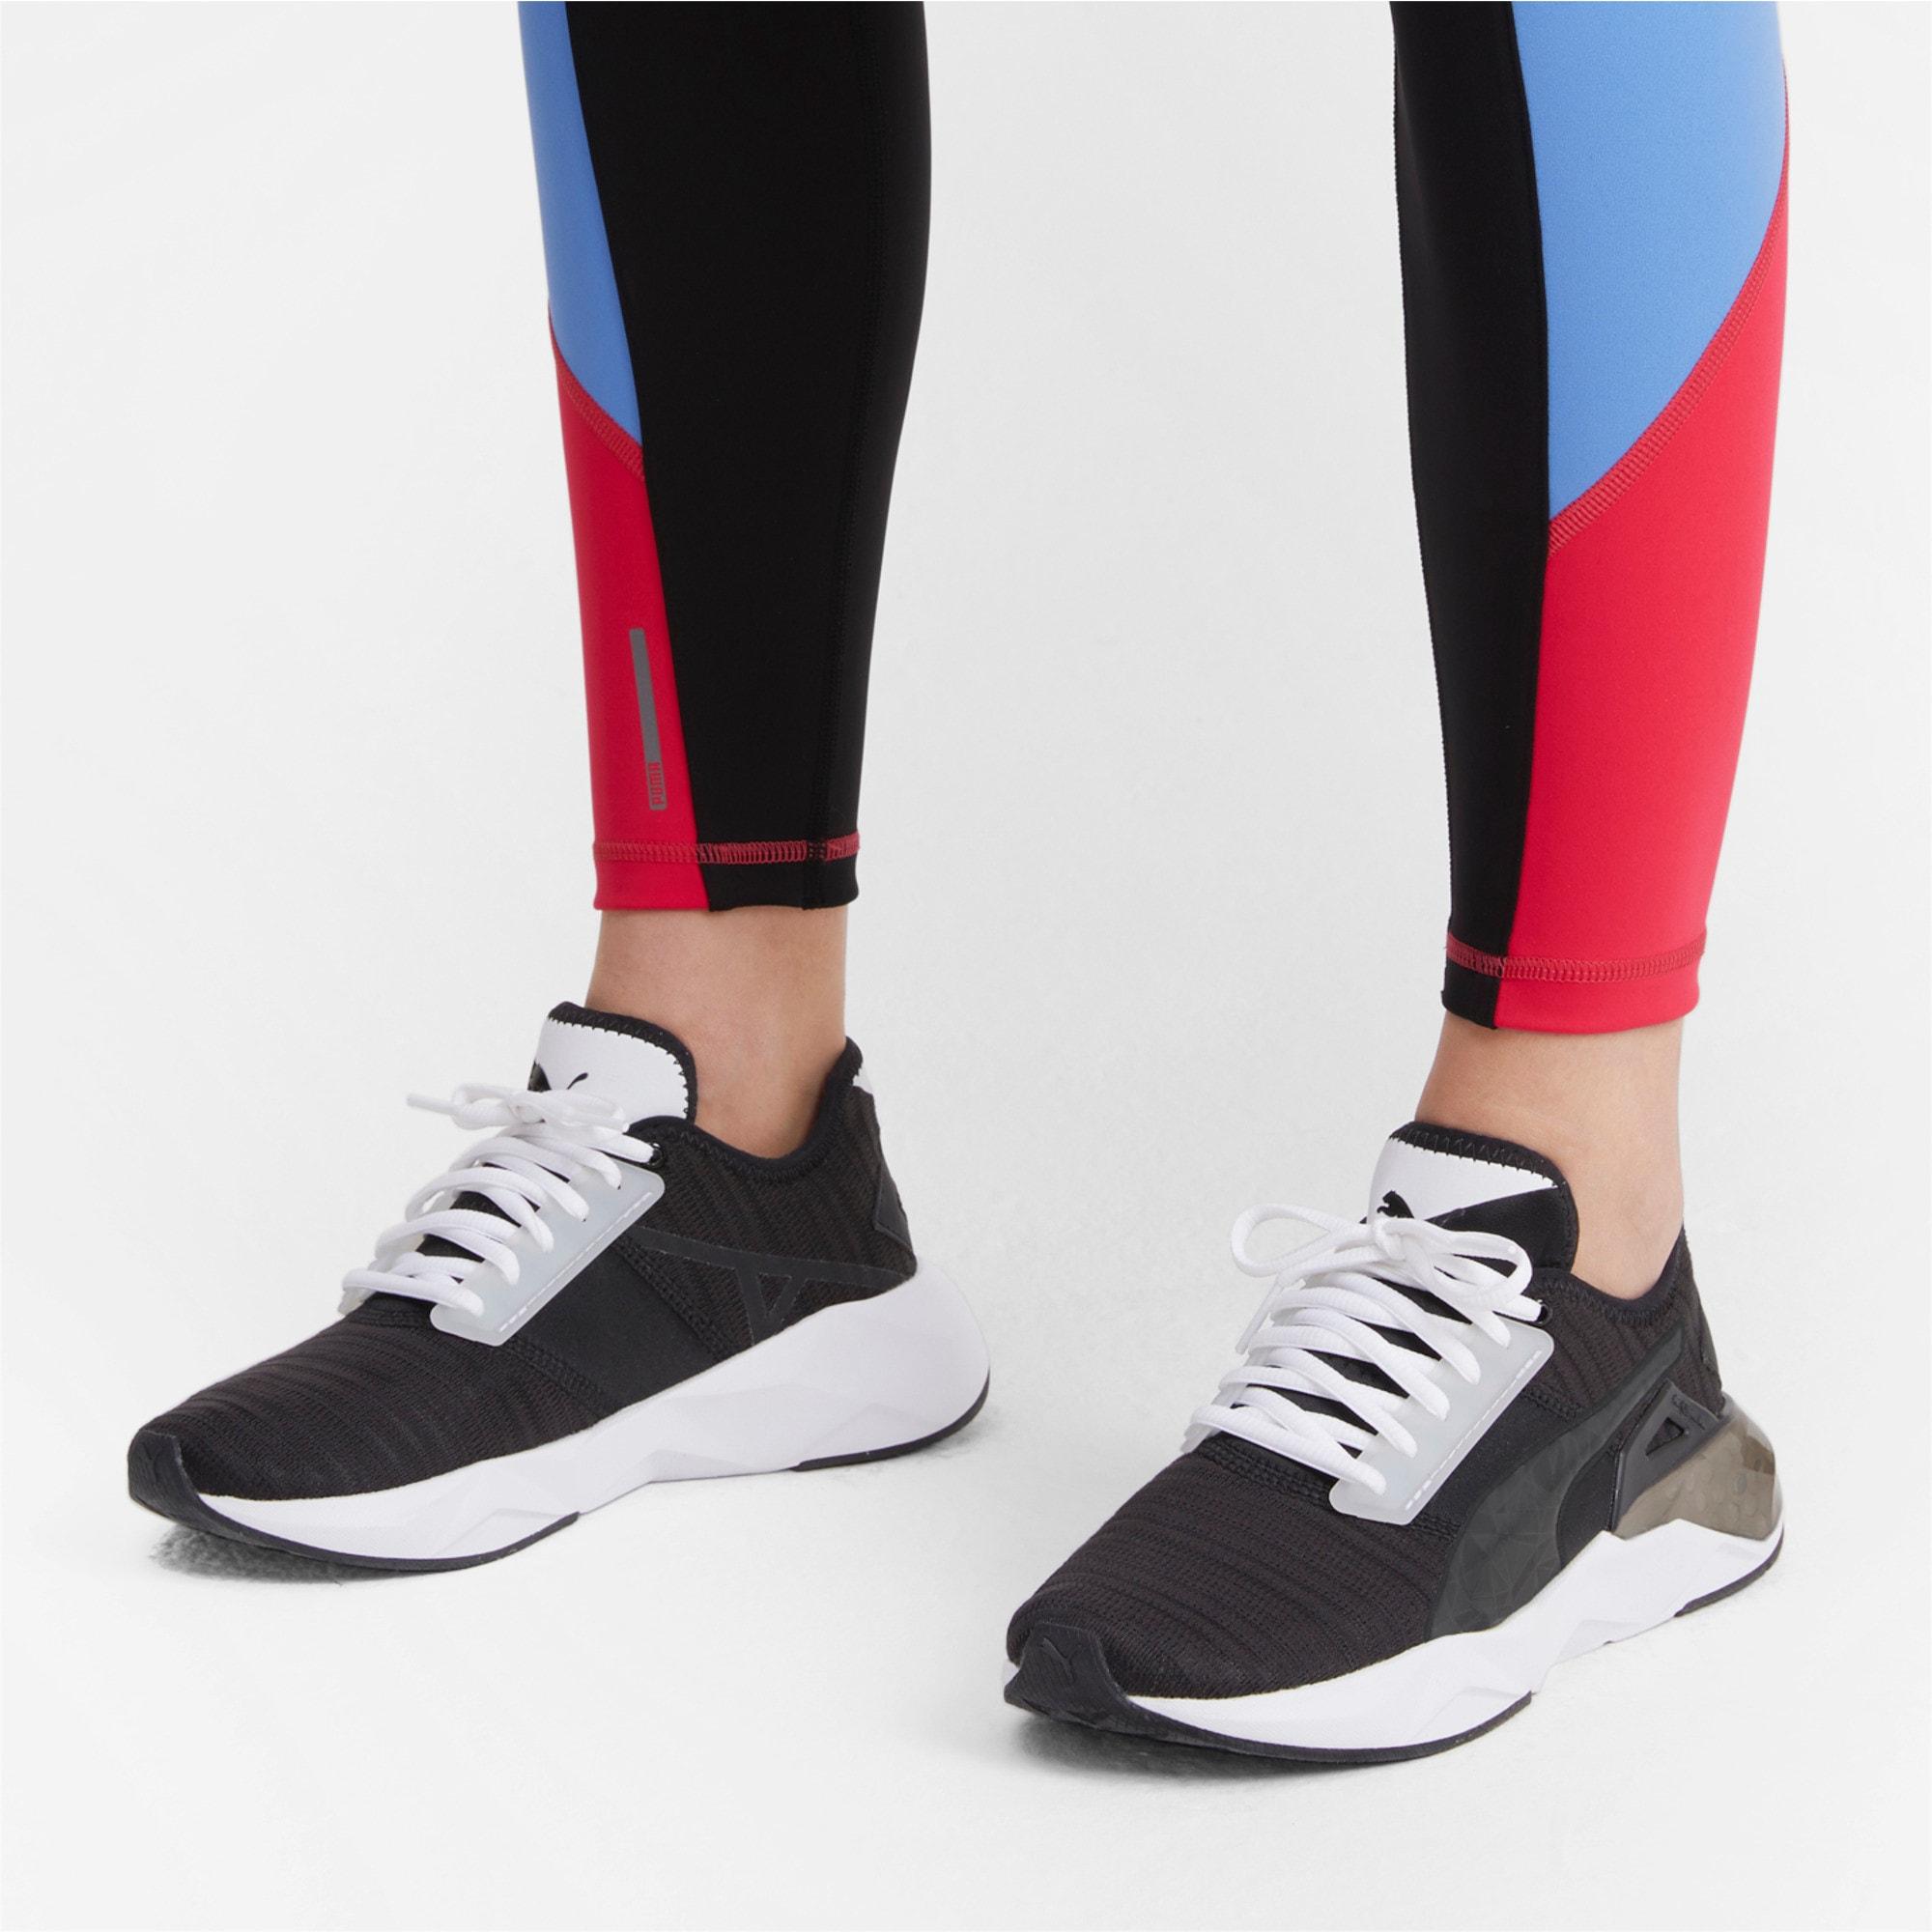 Imagen en miniatura 2 de Zapatillass de mujer CELL Plasmic, Puma Black-Puma White, mediana